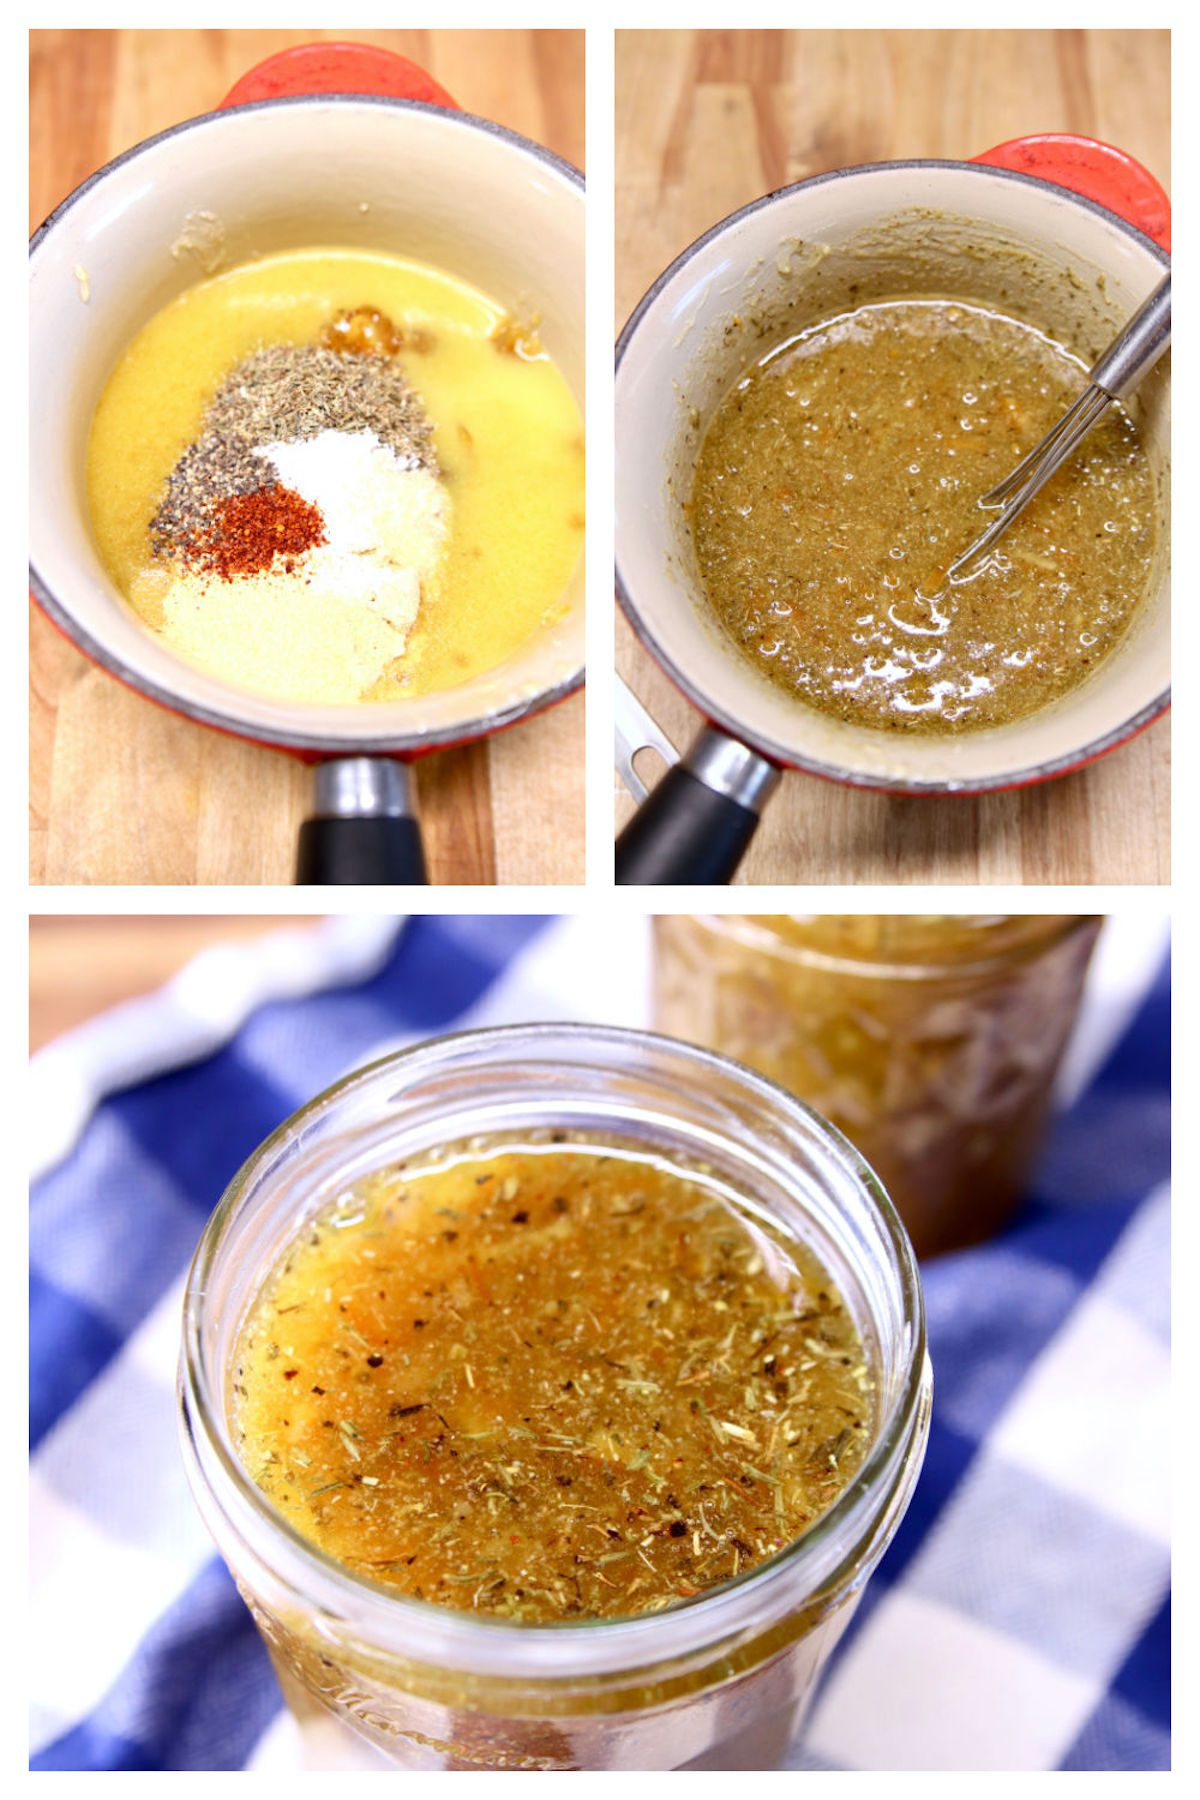 collage making orange ginger sauce: ingredients in pan/cooked/in a jar